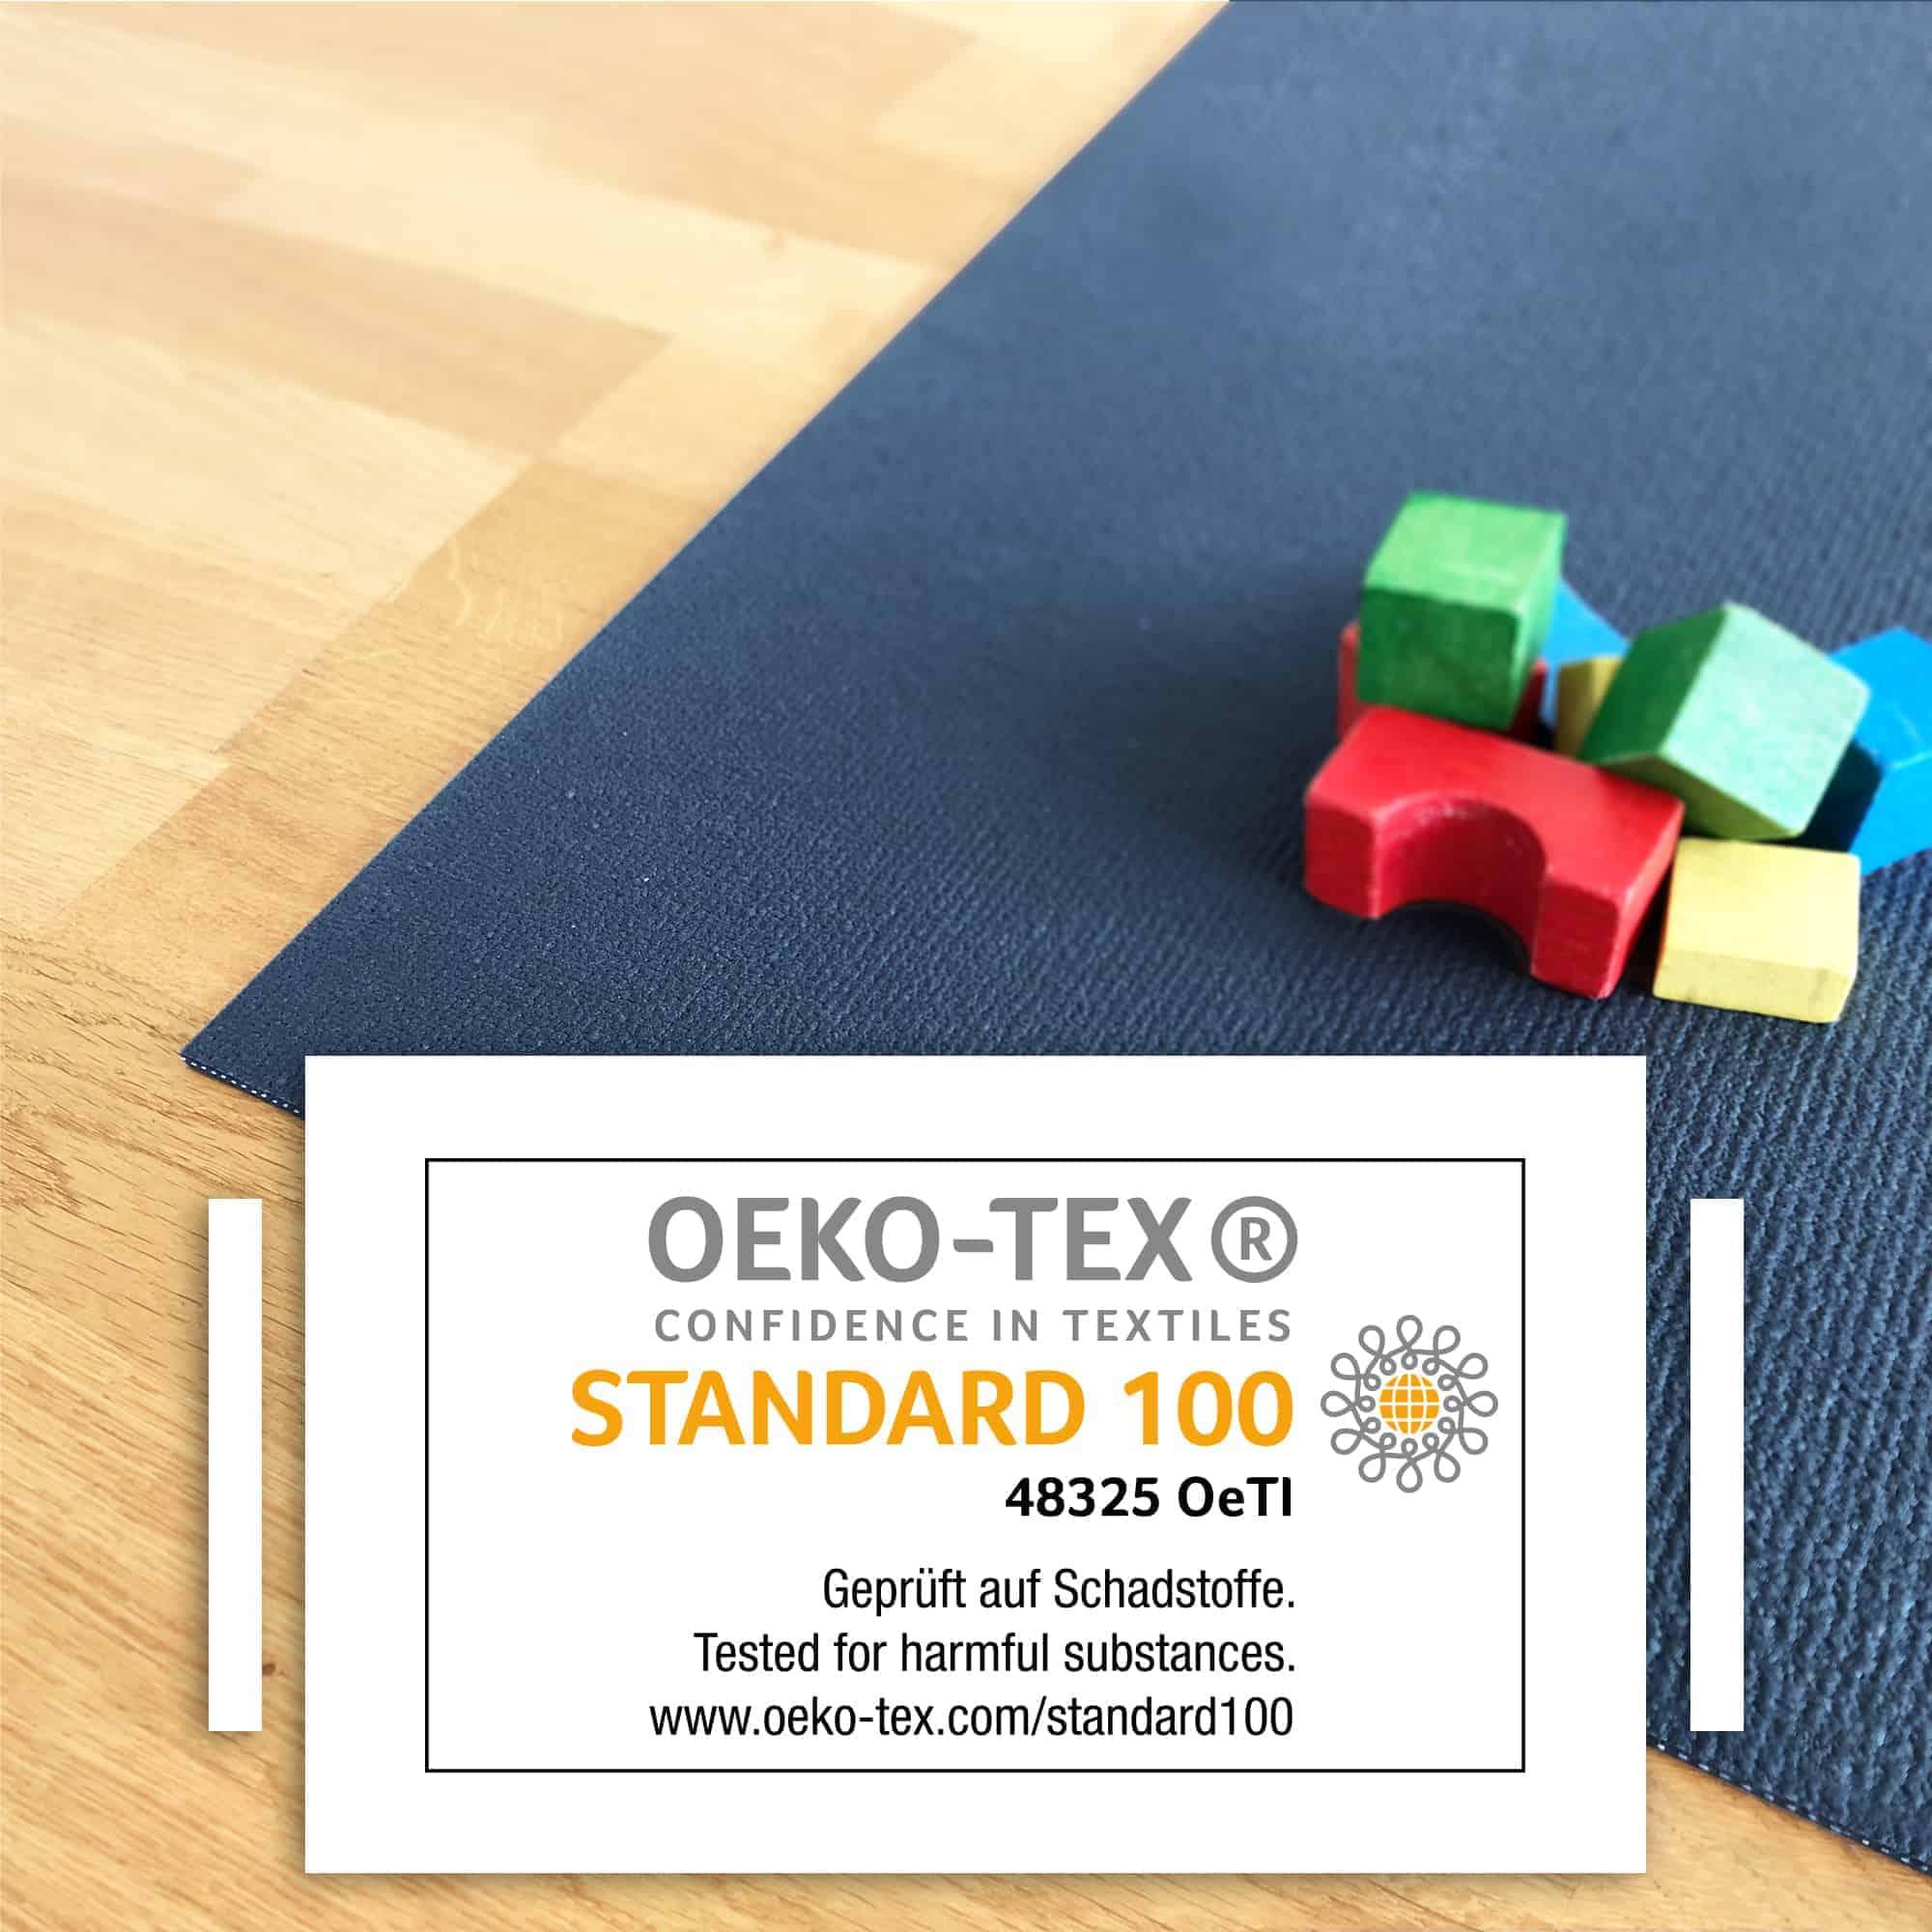 stabil Teppichschutz rutschfest YINN Stuhlmatte 1,3 mm 60 x 40 cm kratzfest glatt f/ür Hartb/öden B/ürostuhlmatte PVC Rollmatte